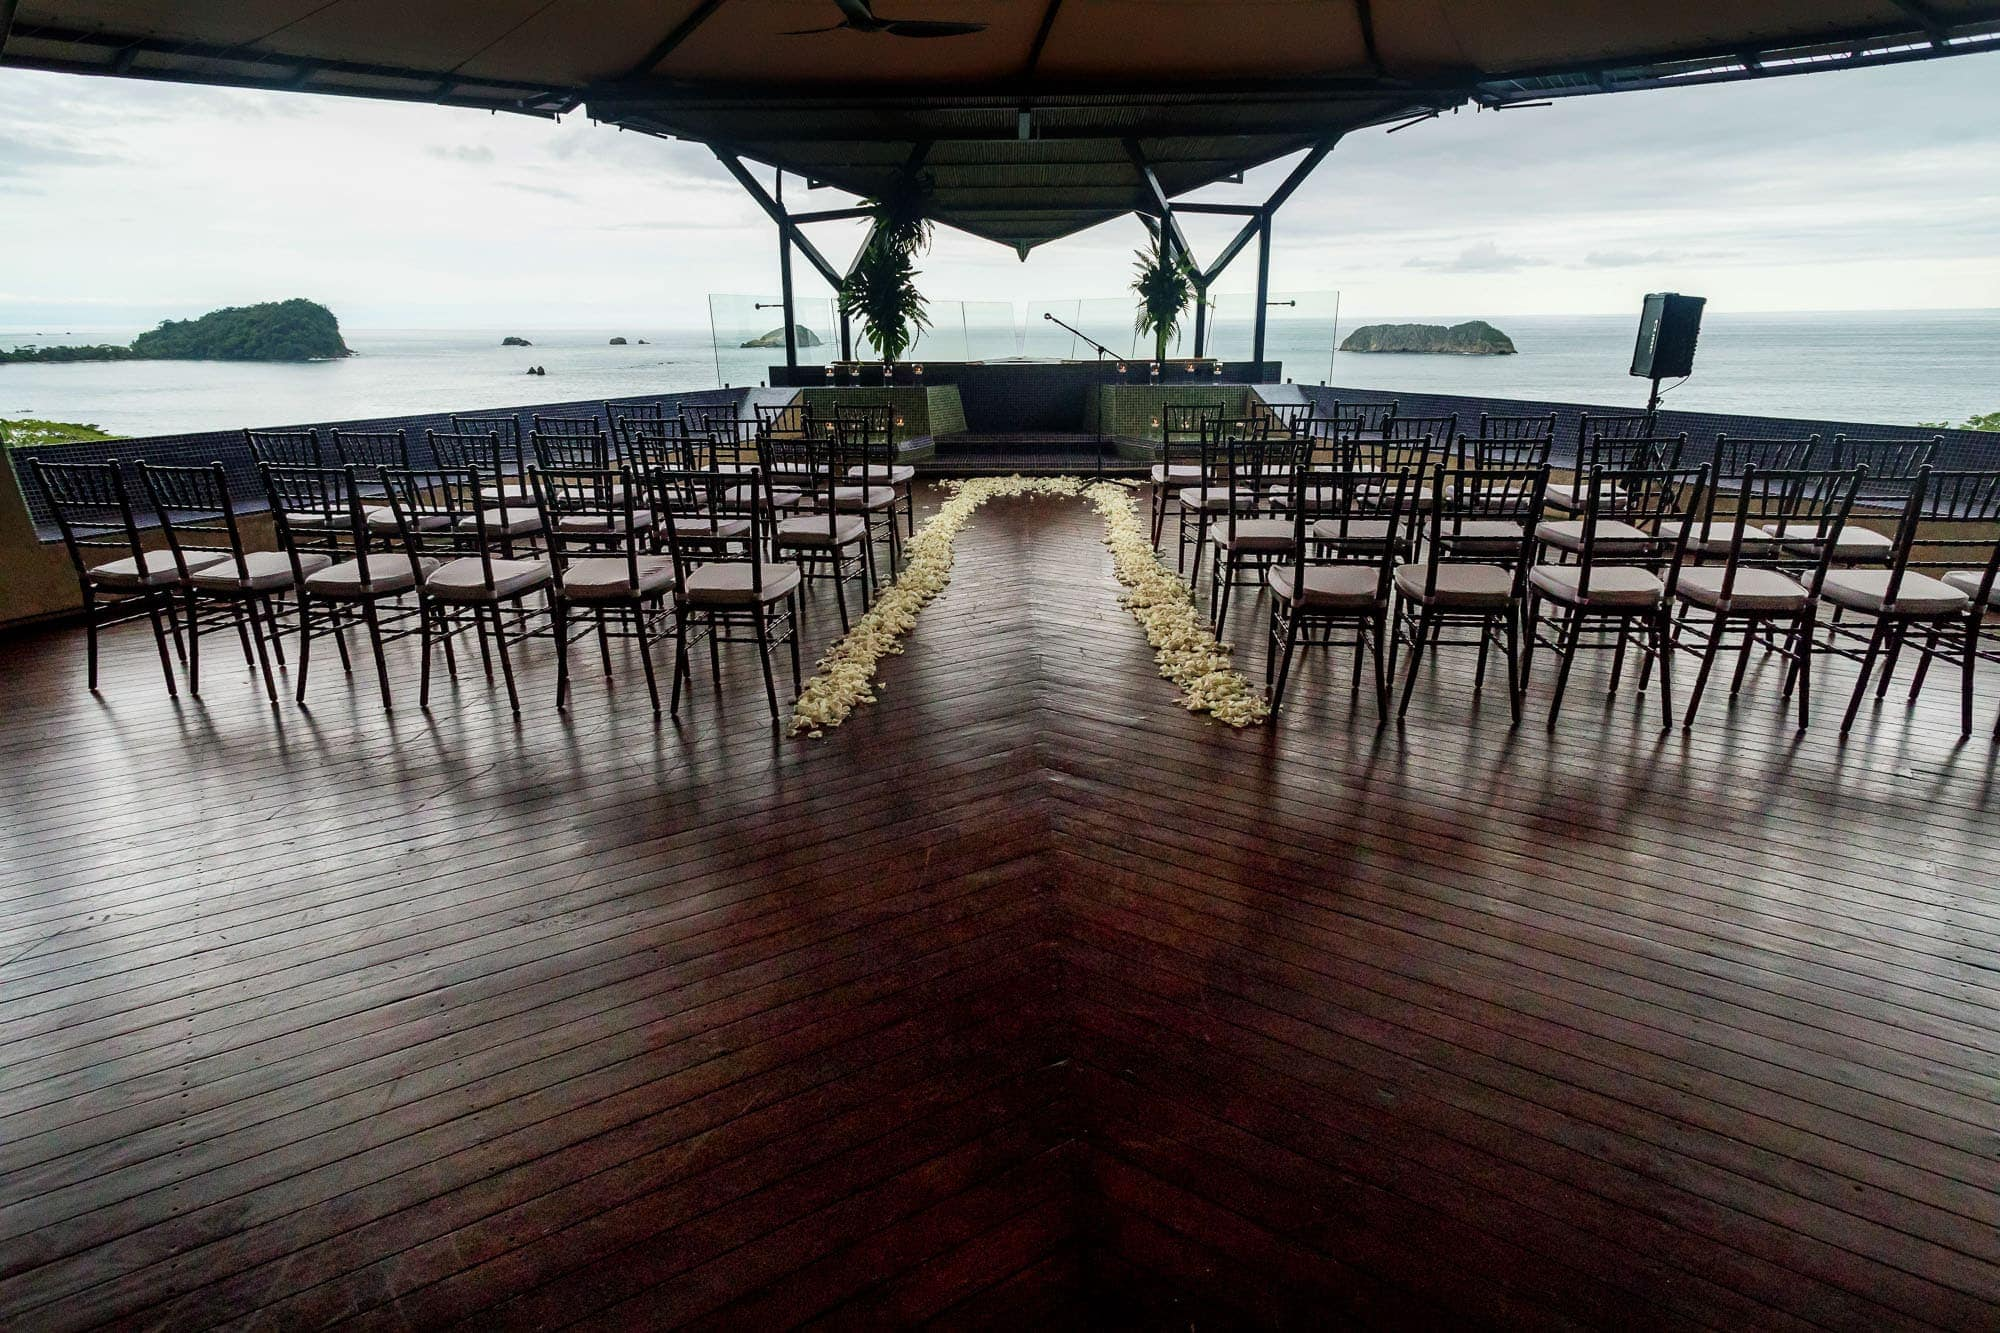 The ceremony location setup